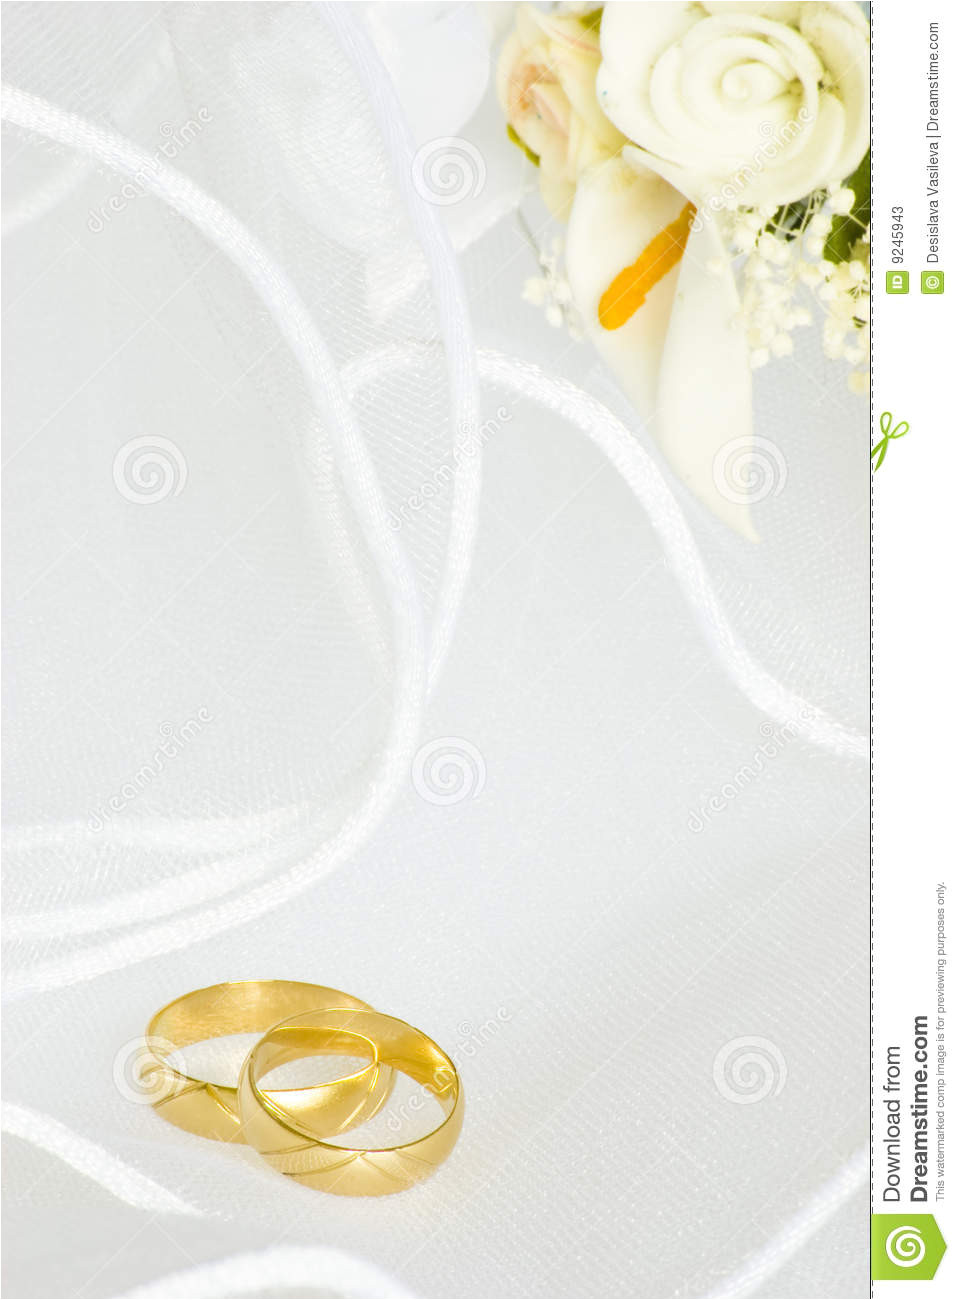 stock photos wedding invitation rings flowers over veil image9245943